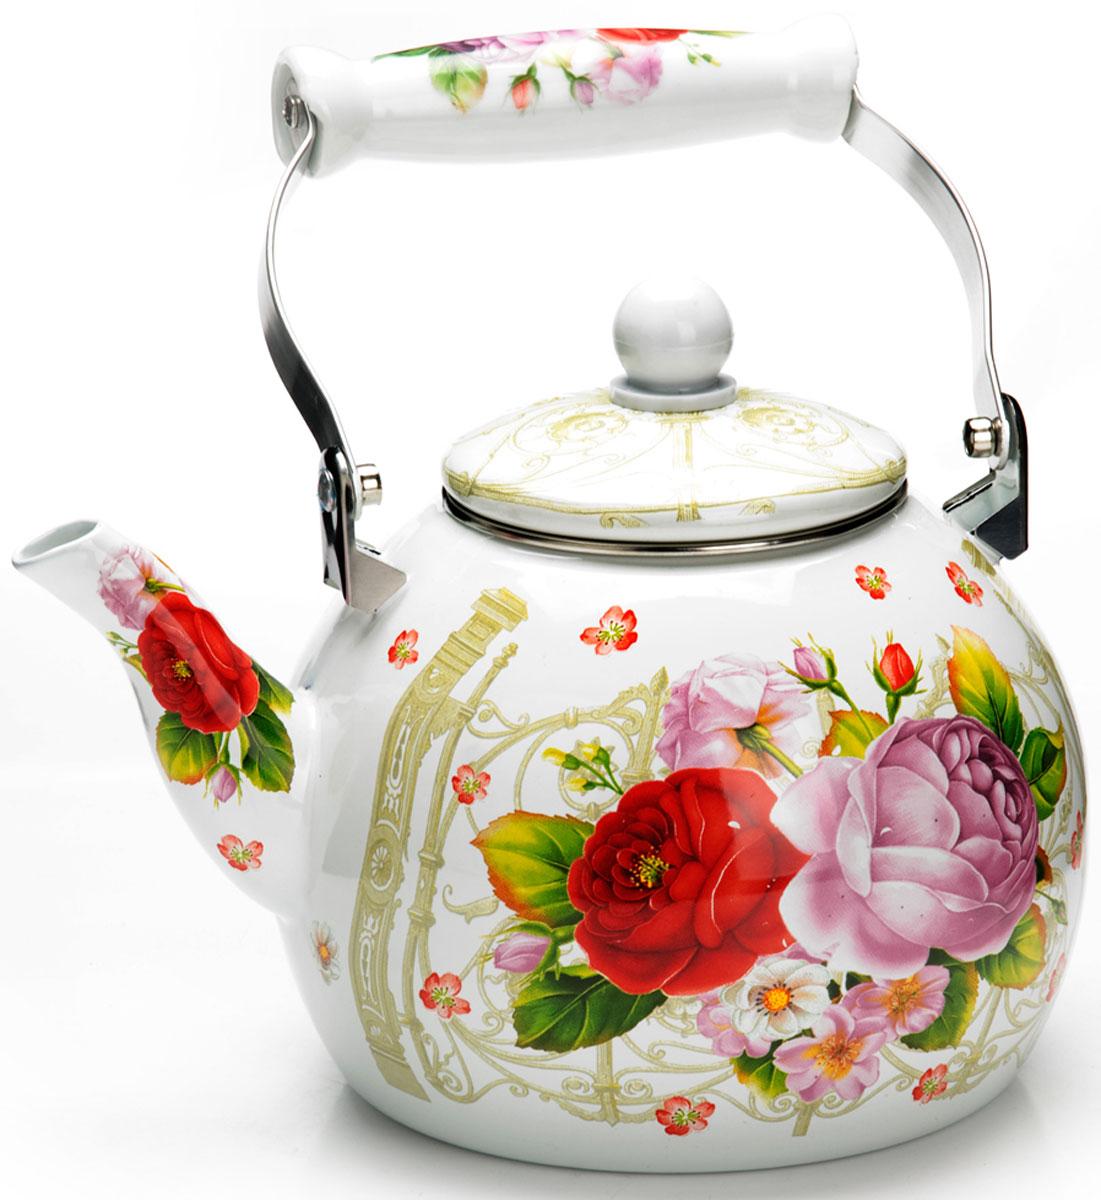 Чайник Mayer & Boch Цветы, 3 л. 26499 mayer